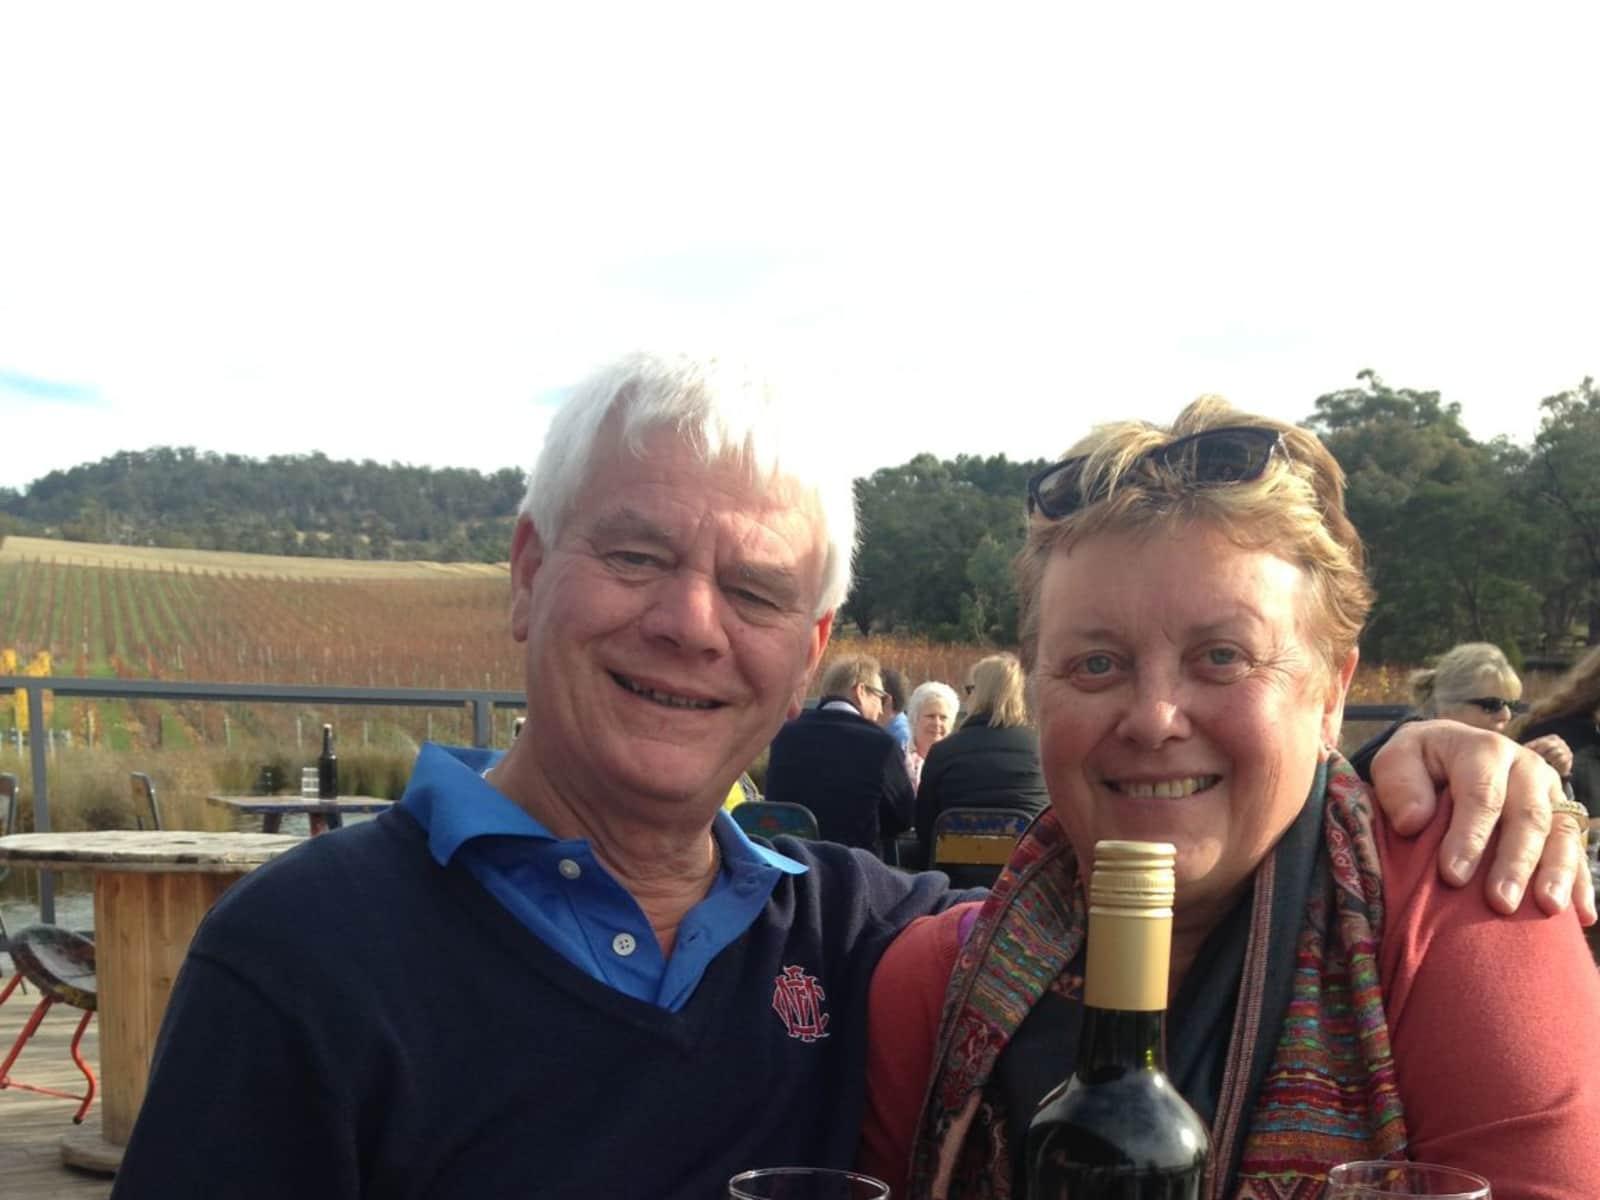 Sue-anne & Noel from Hobart, Tasmania, Australia